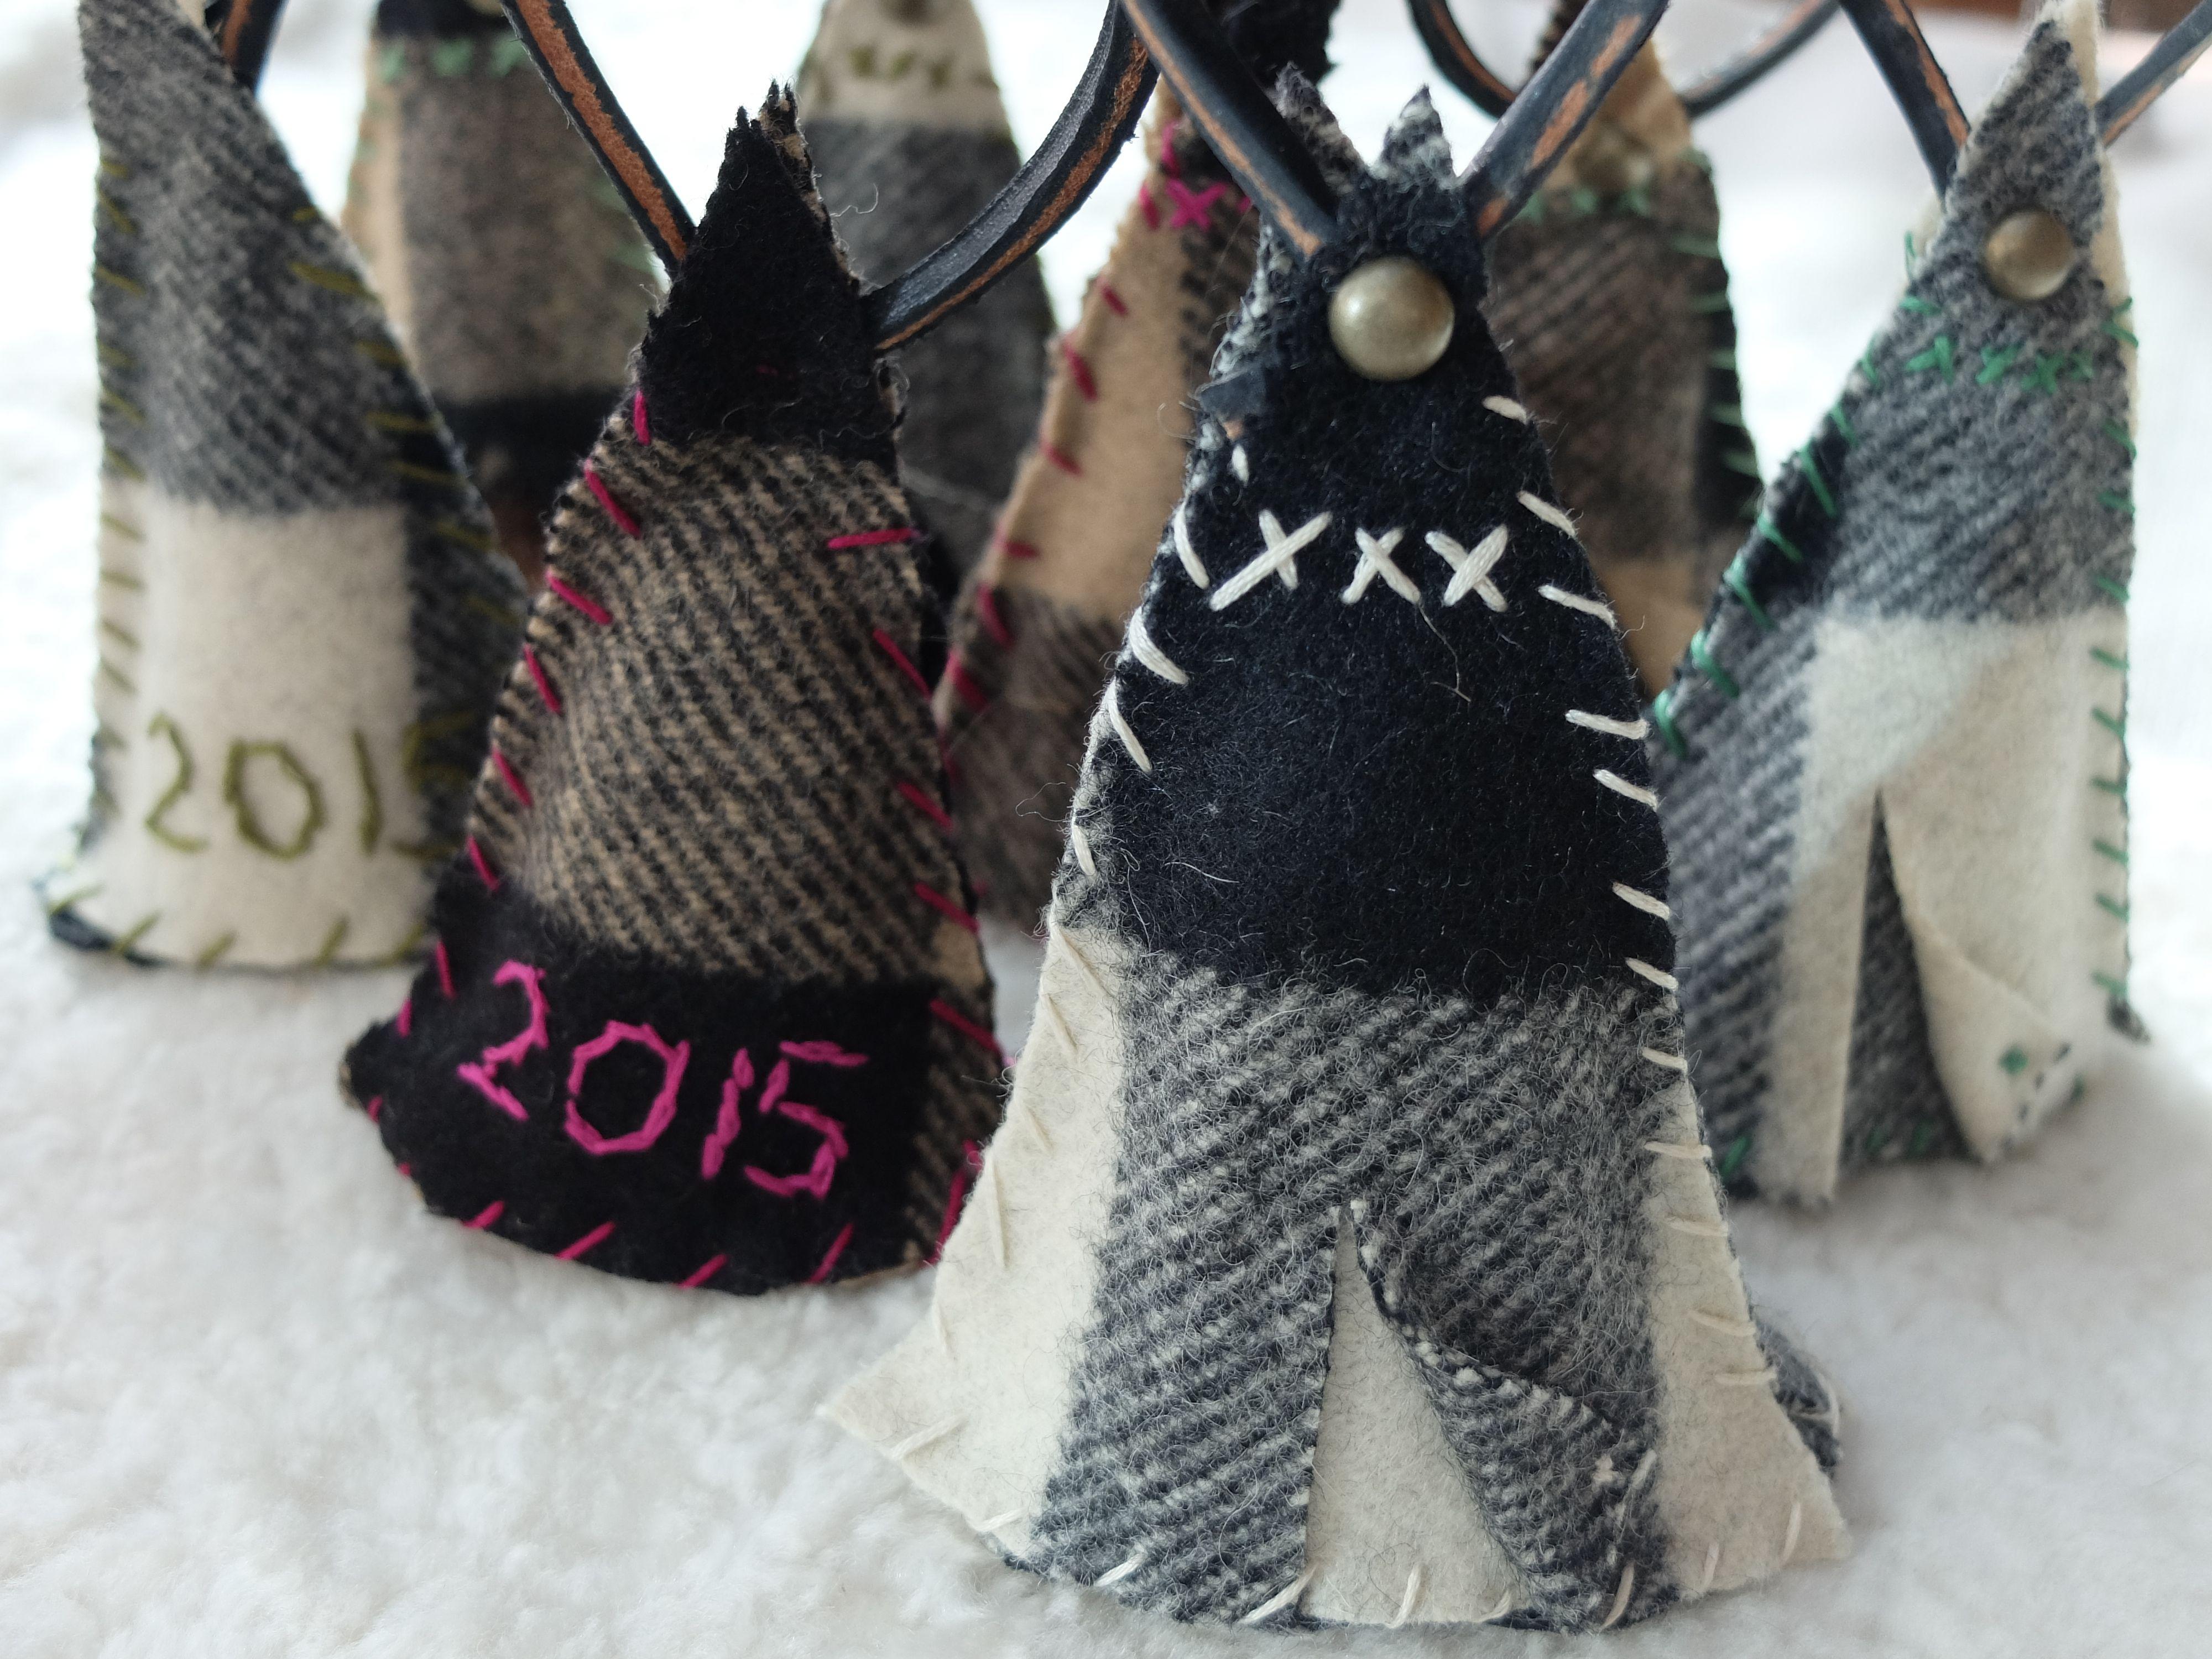 Pow Wow Teepee ornaments